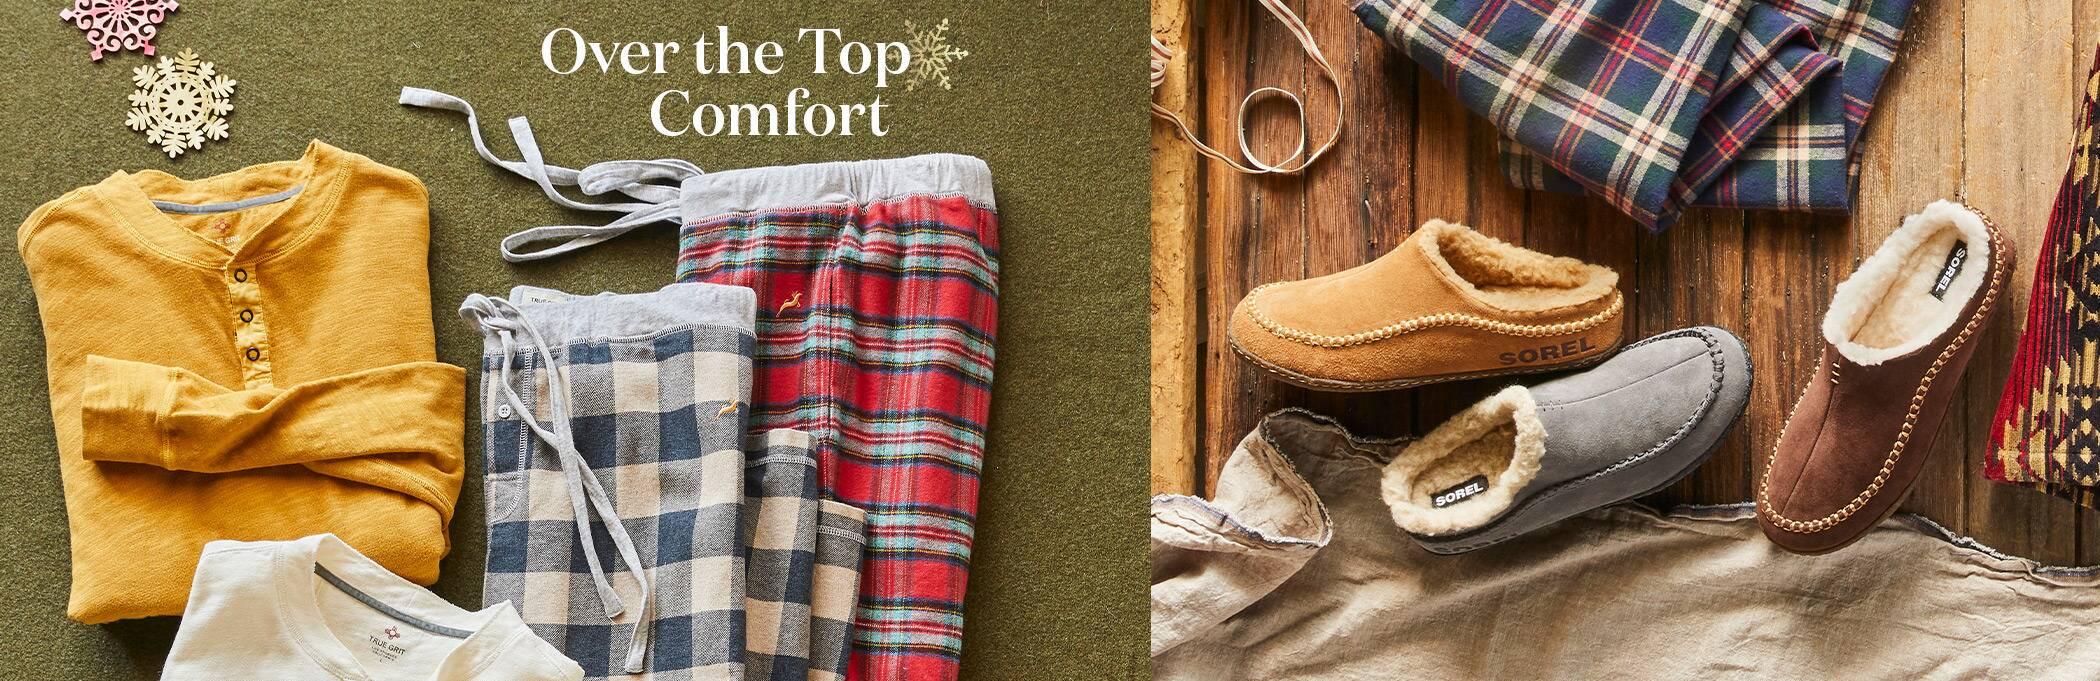 Men's Sleepwear and Slippers